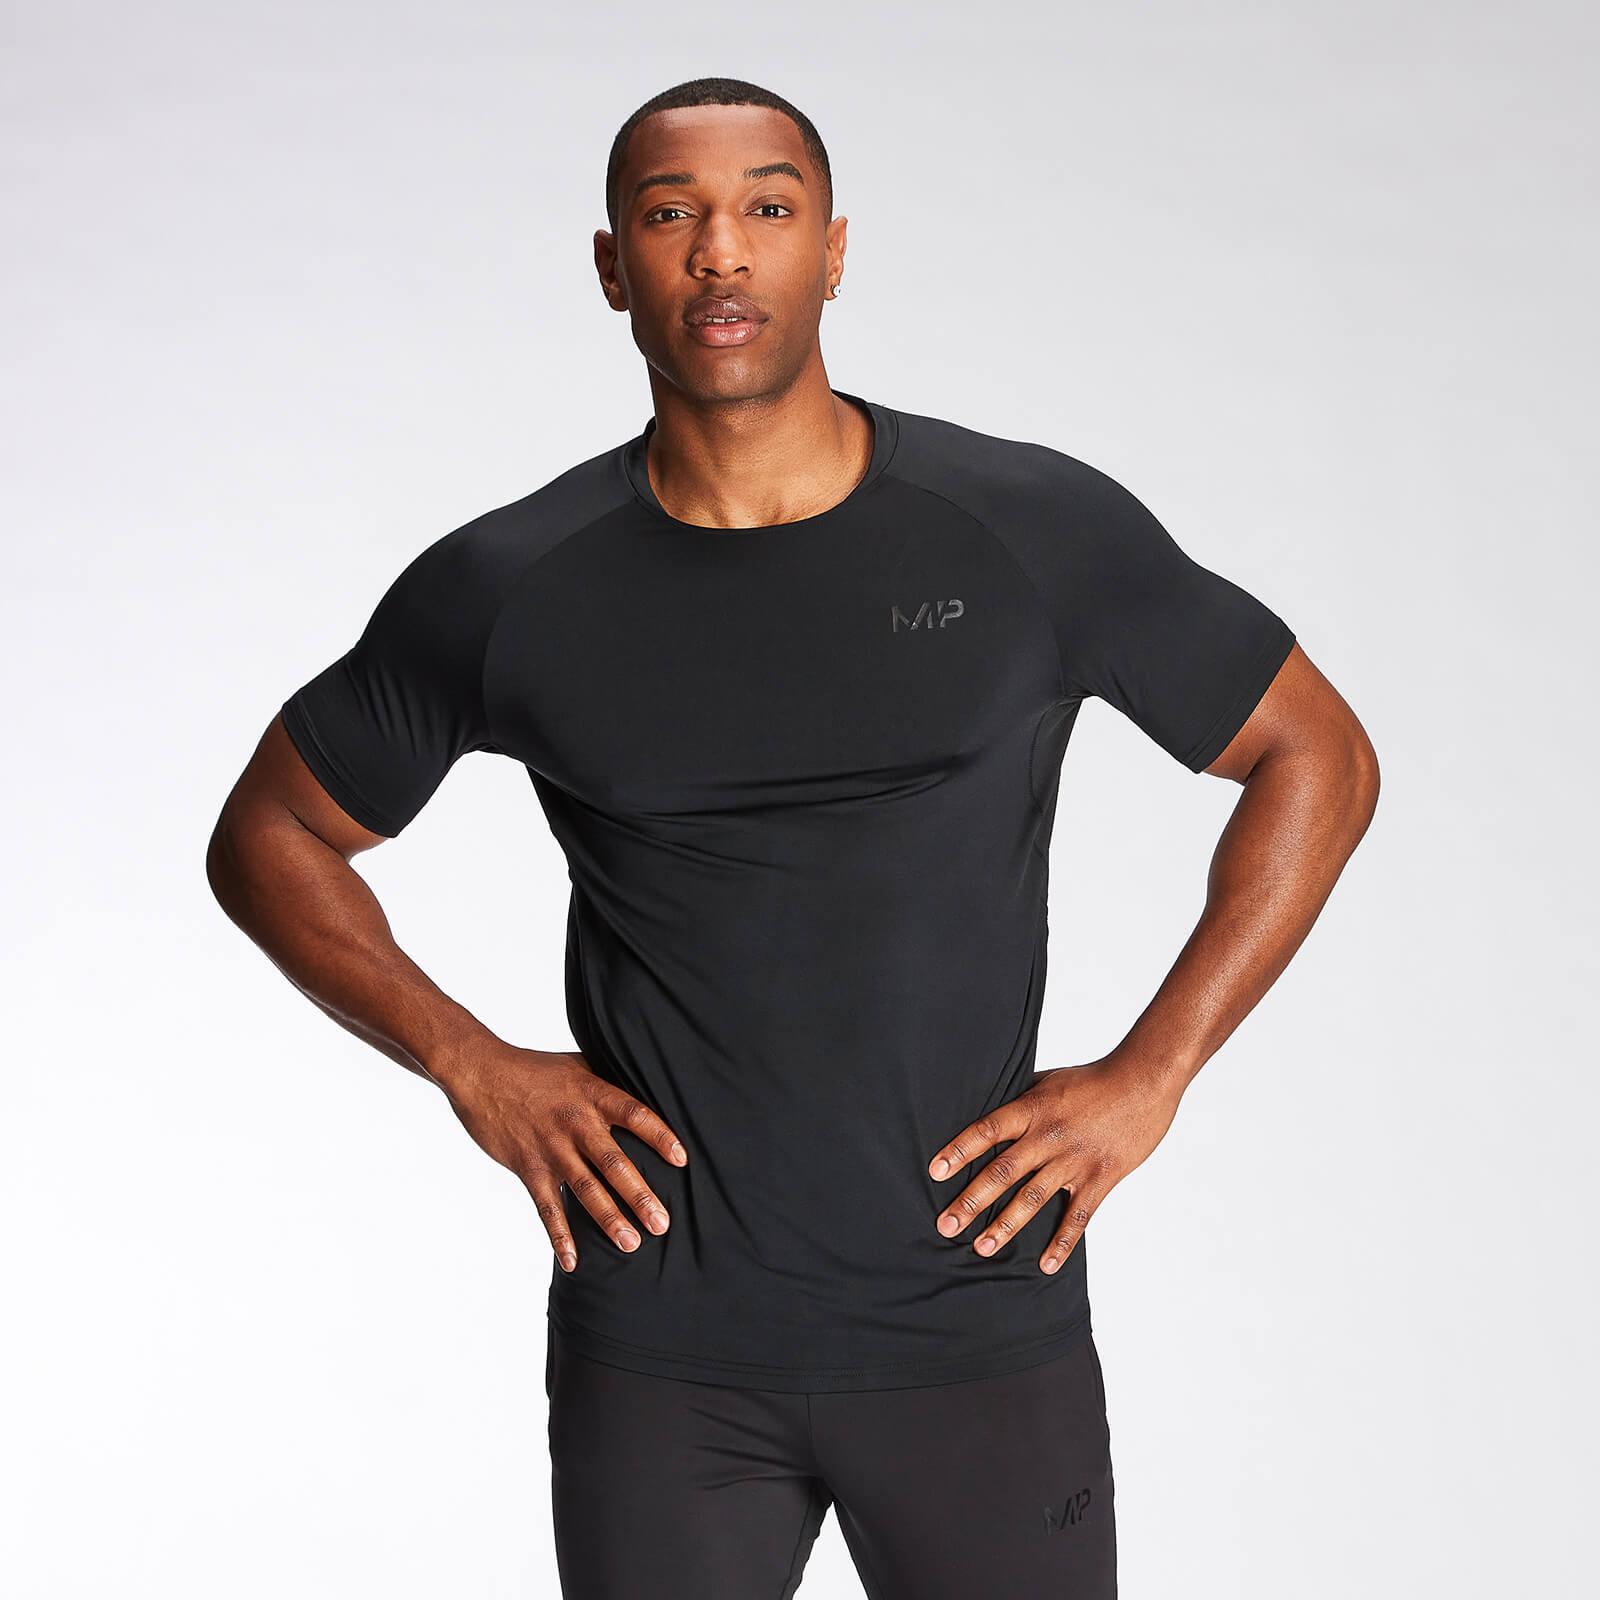 Купить MP Men's Agility Short Sleeve T-Shirt - Black - XXL, Myprotein International